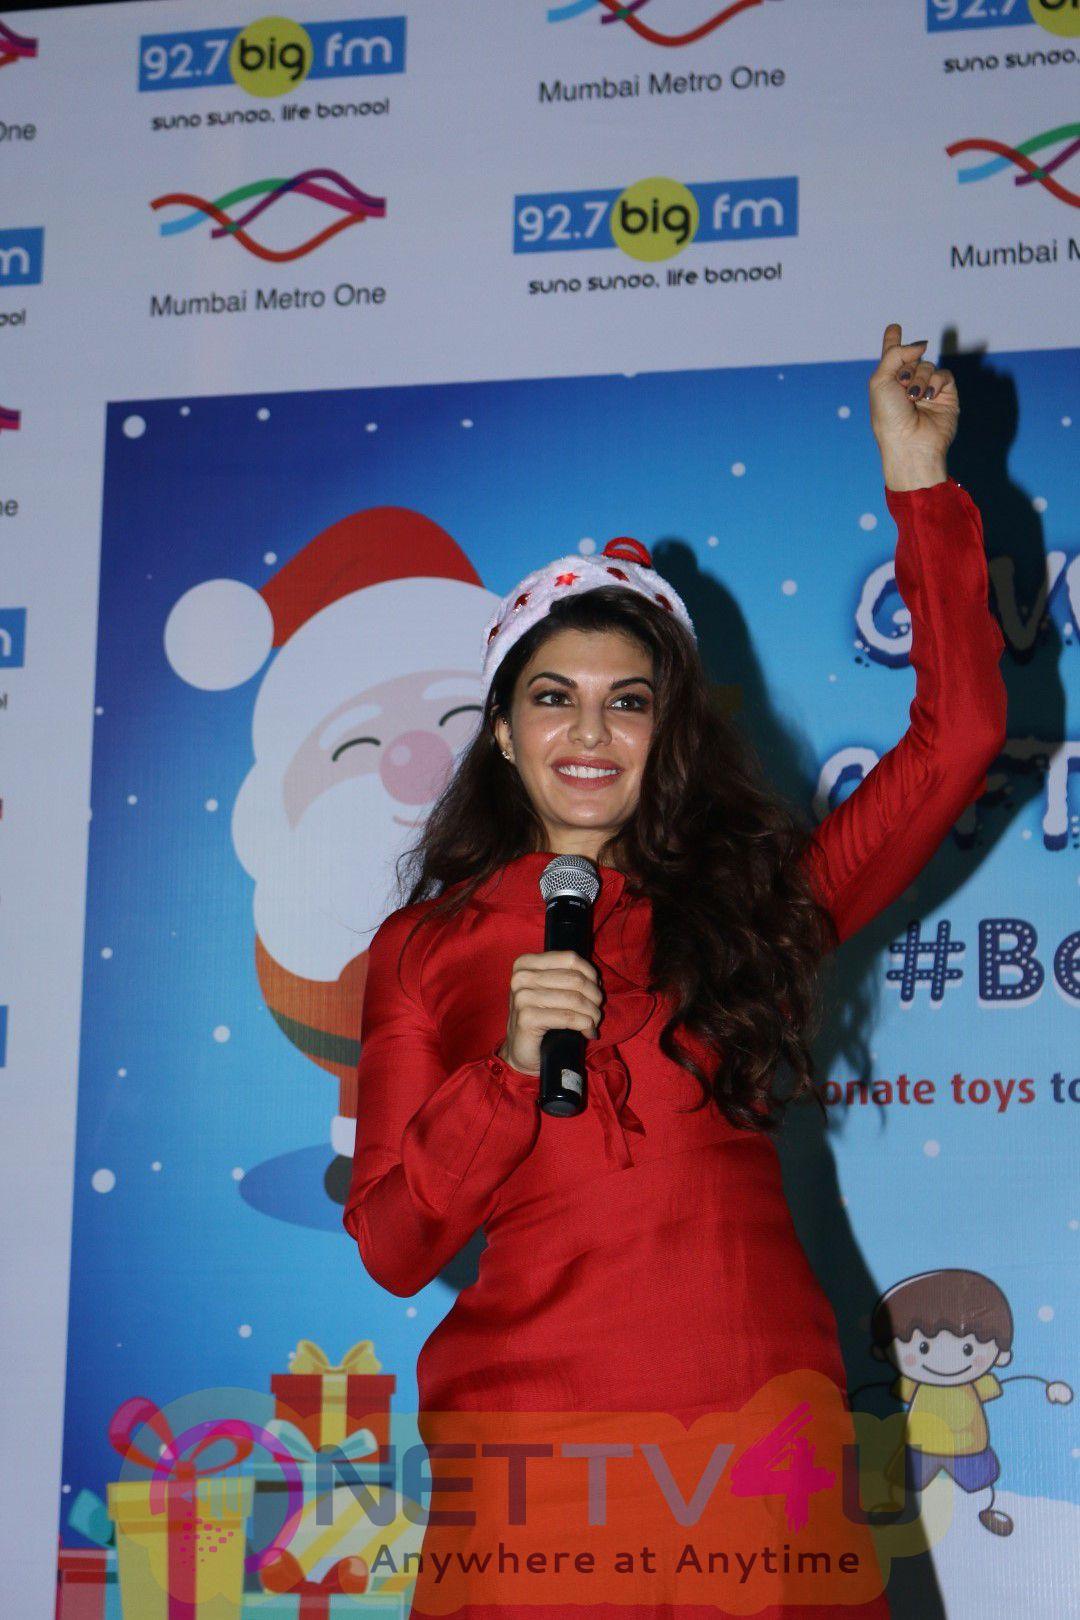 Jacqueline Fernandez Celebrates Christmas With Kids Of Angel Xpress Foundation Photos